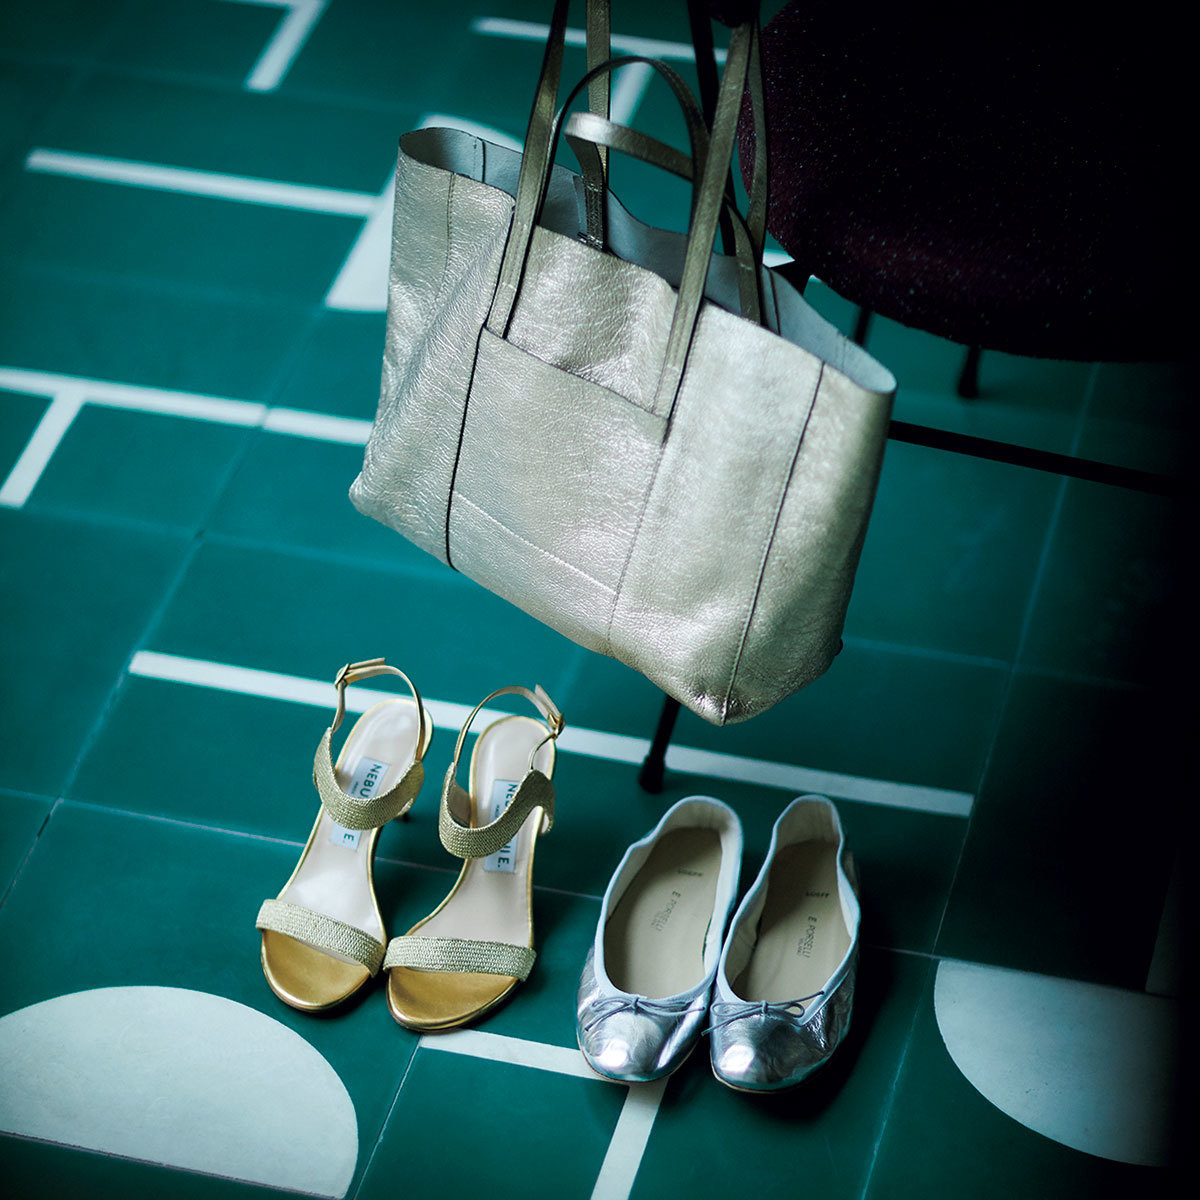 ■METALLIC ITEM:メタリック小物 メタリックの靴やバッグは、ヴィンテージライクなタイプを選ぶのが正確